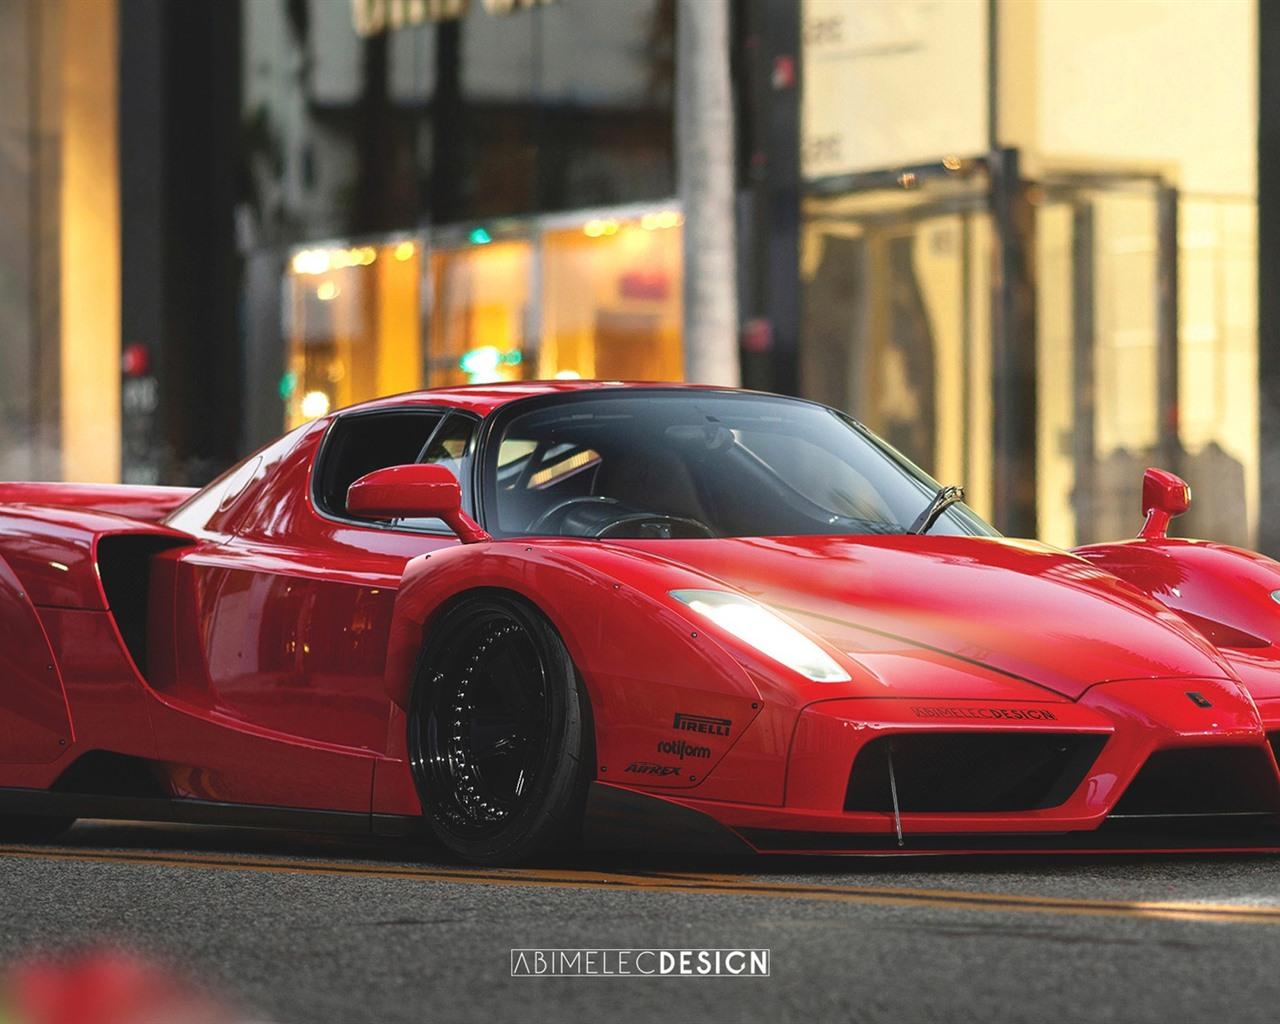 Wallpaper Ferrari Enzo Red Supercar 1920x1080 Full Hd 2k Picture Image